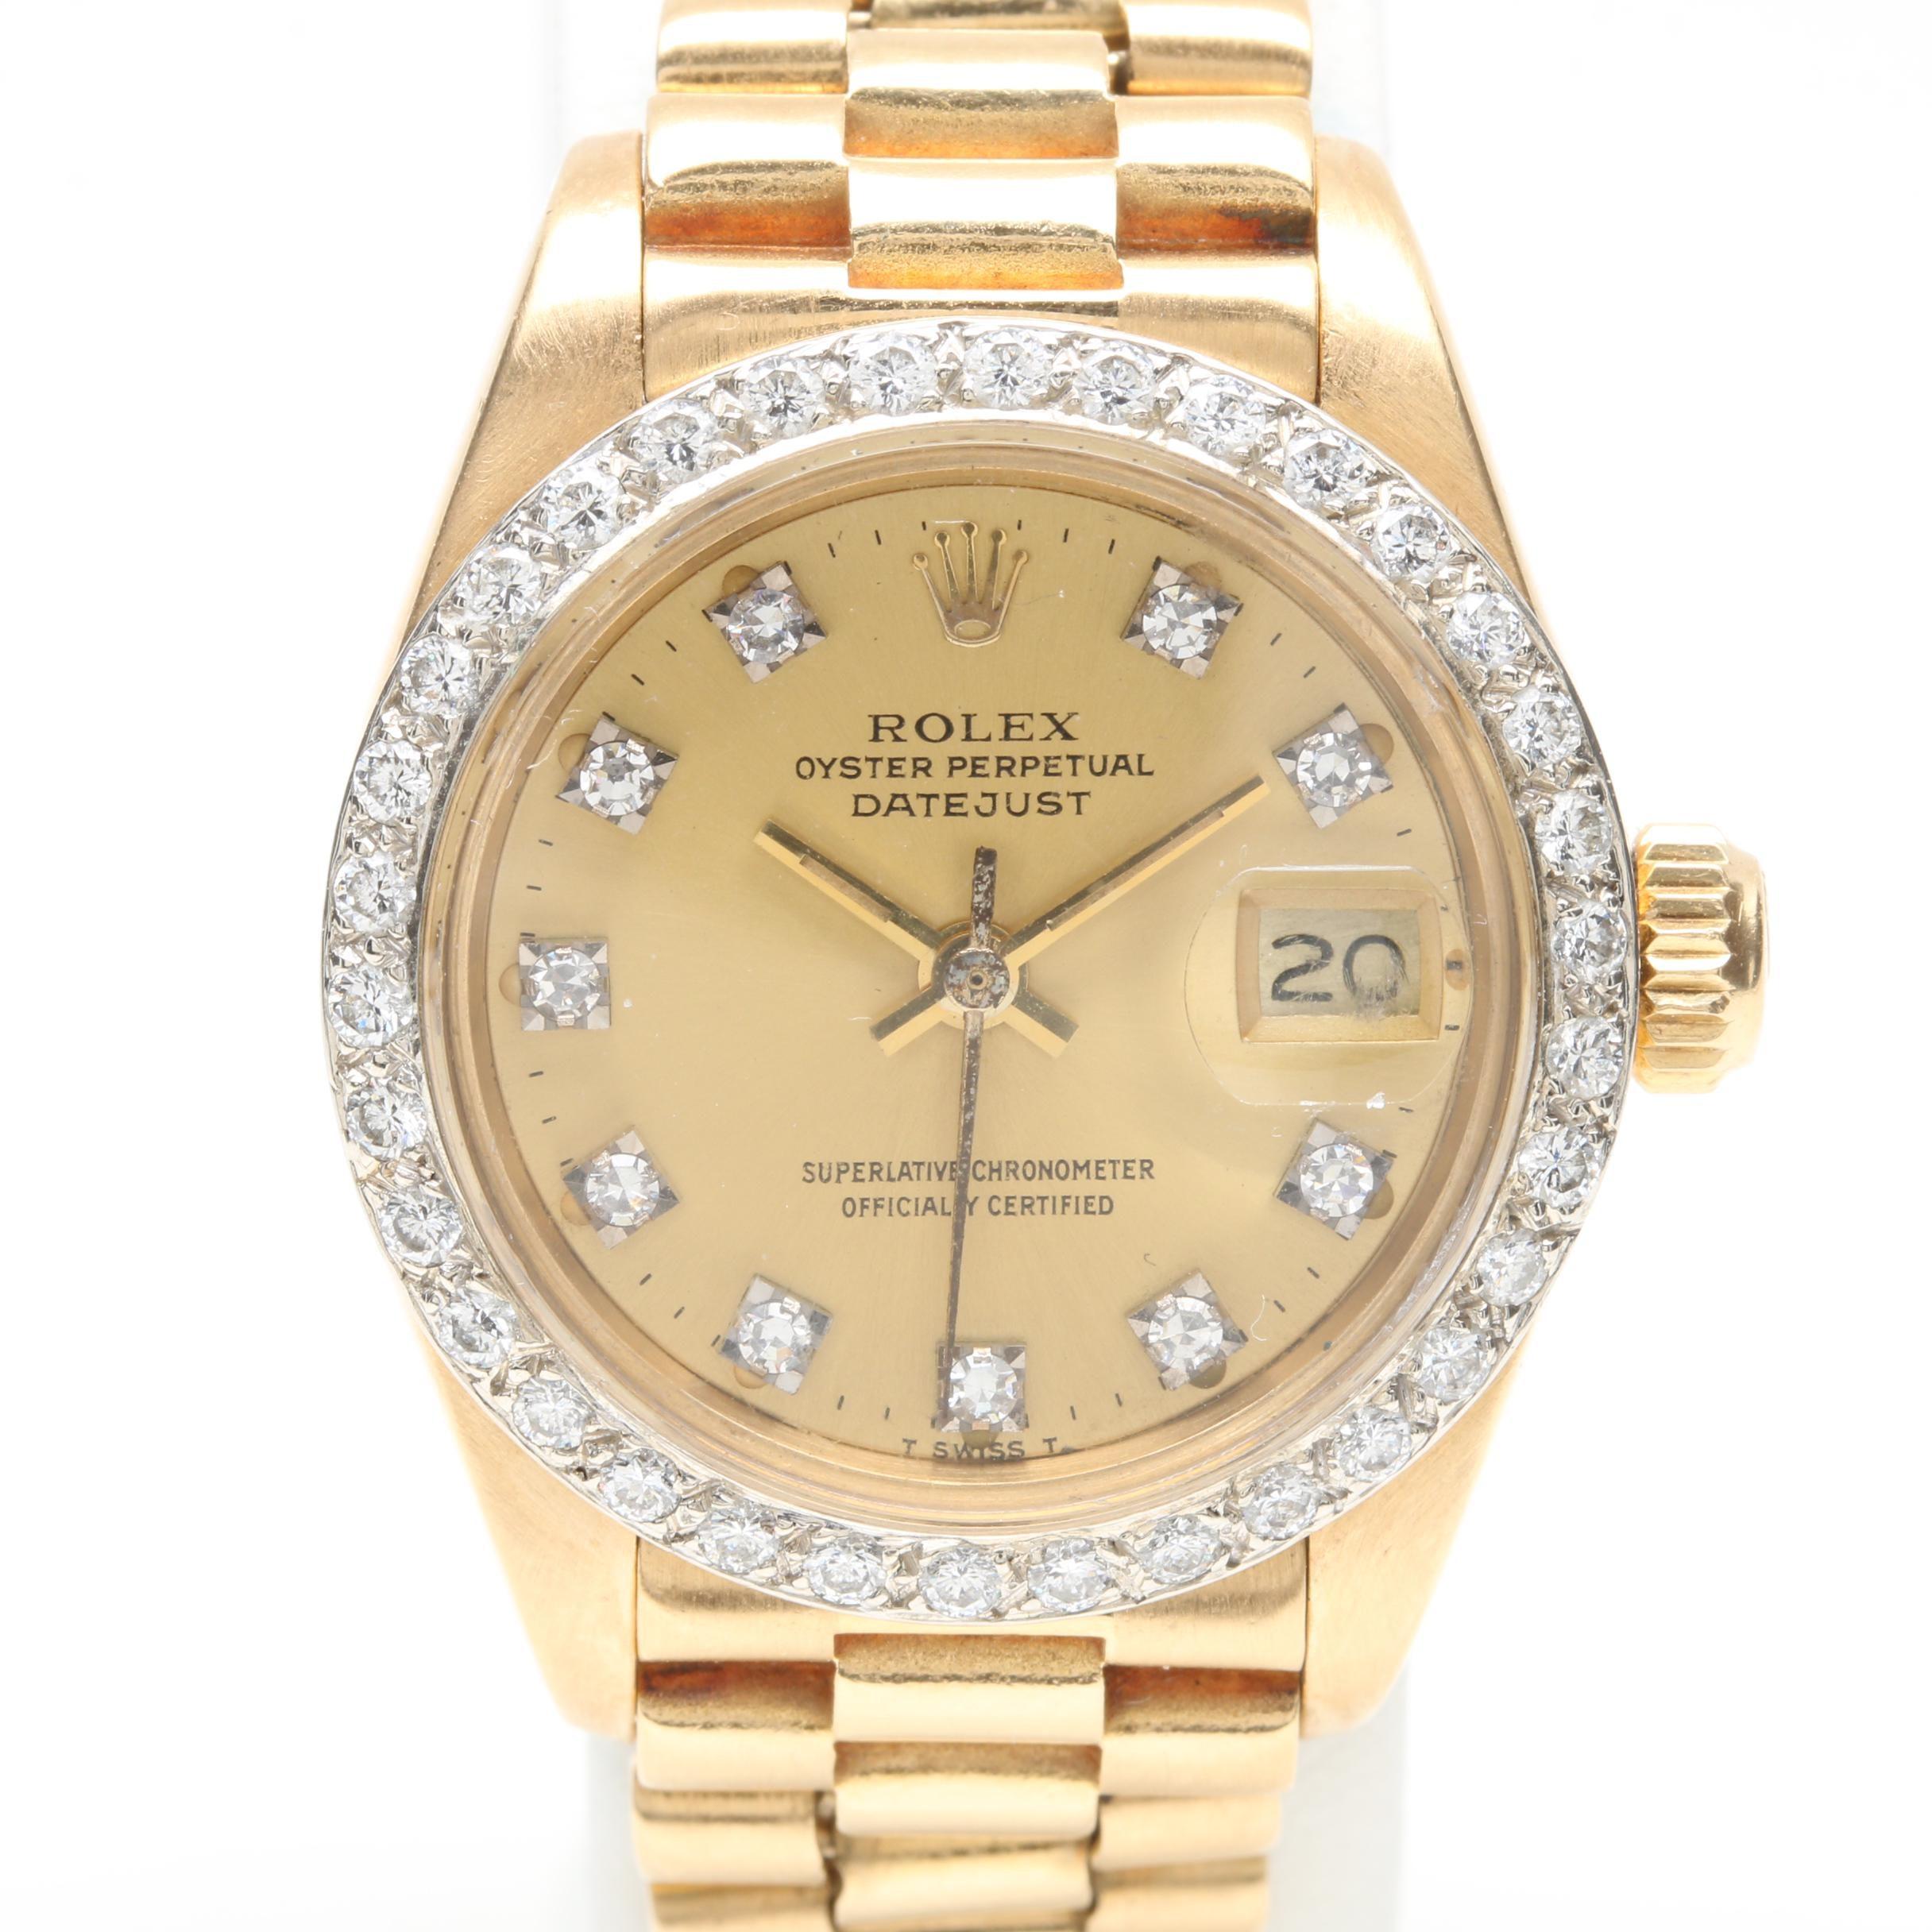 Vintage Rolex Oyster Perpetual Datejust 18K Yellow Gold Diamond Wristwatch